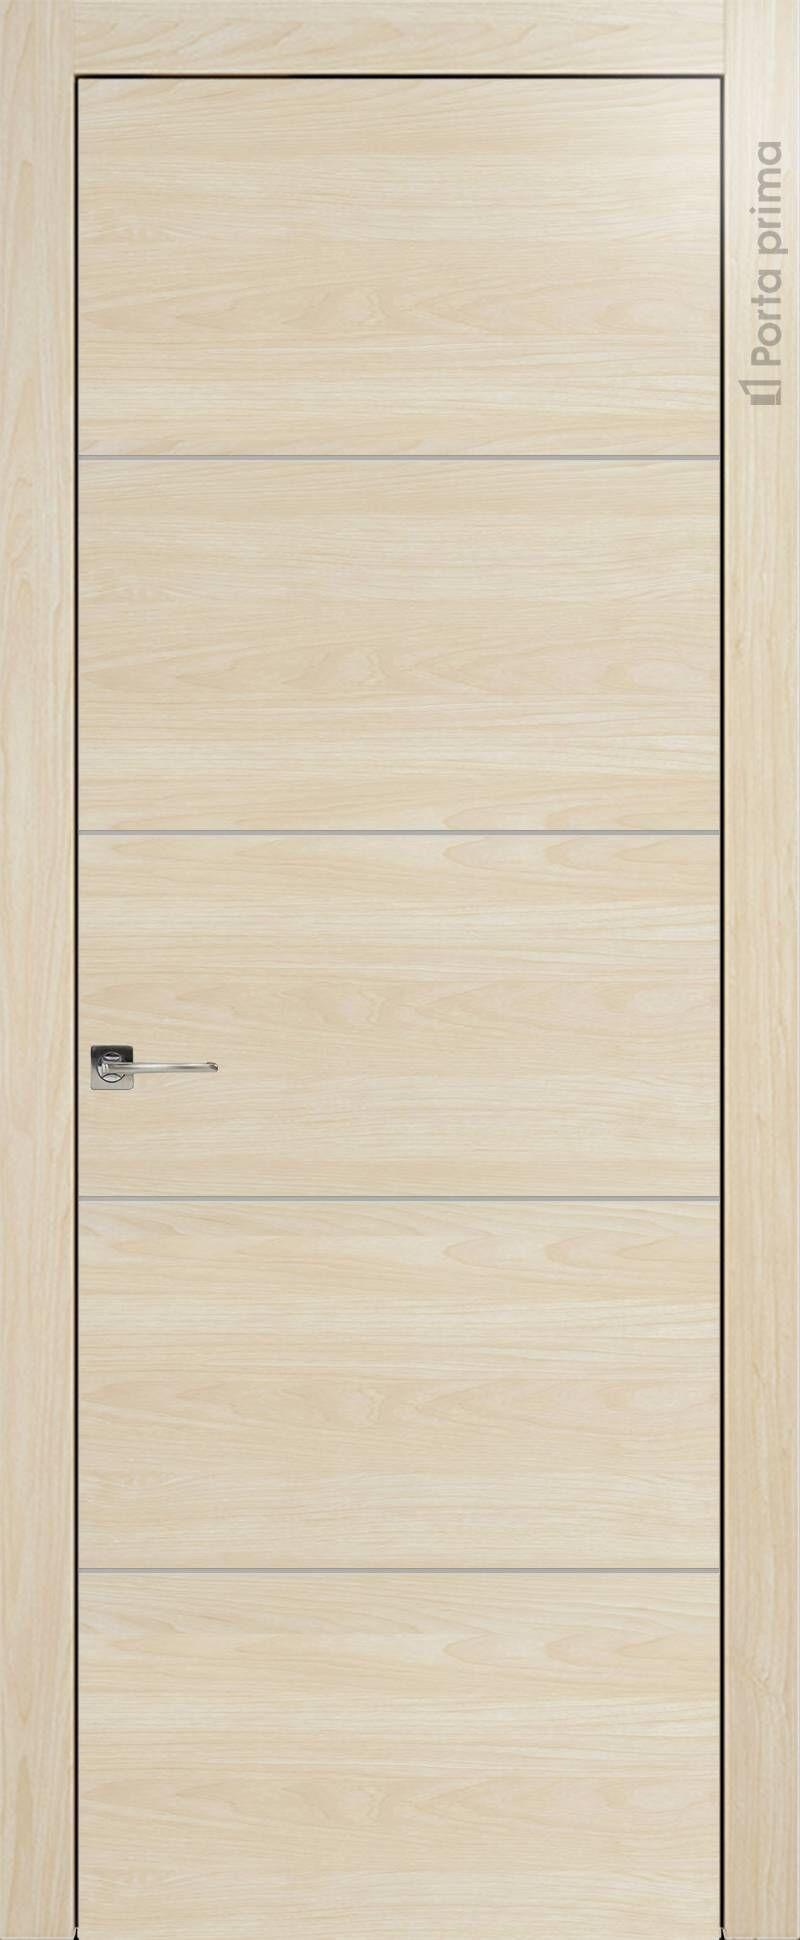 Tivoli Д-2 цвет - Клен Без стекла (ДГ)